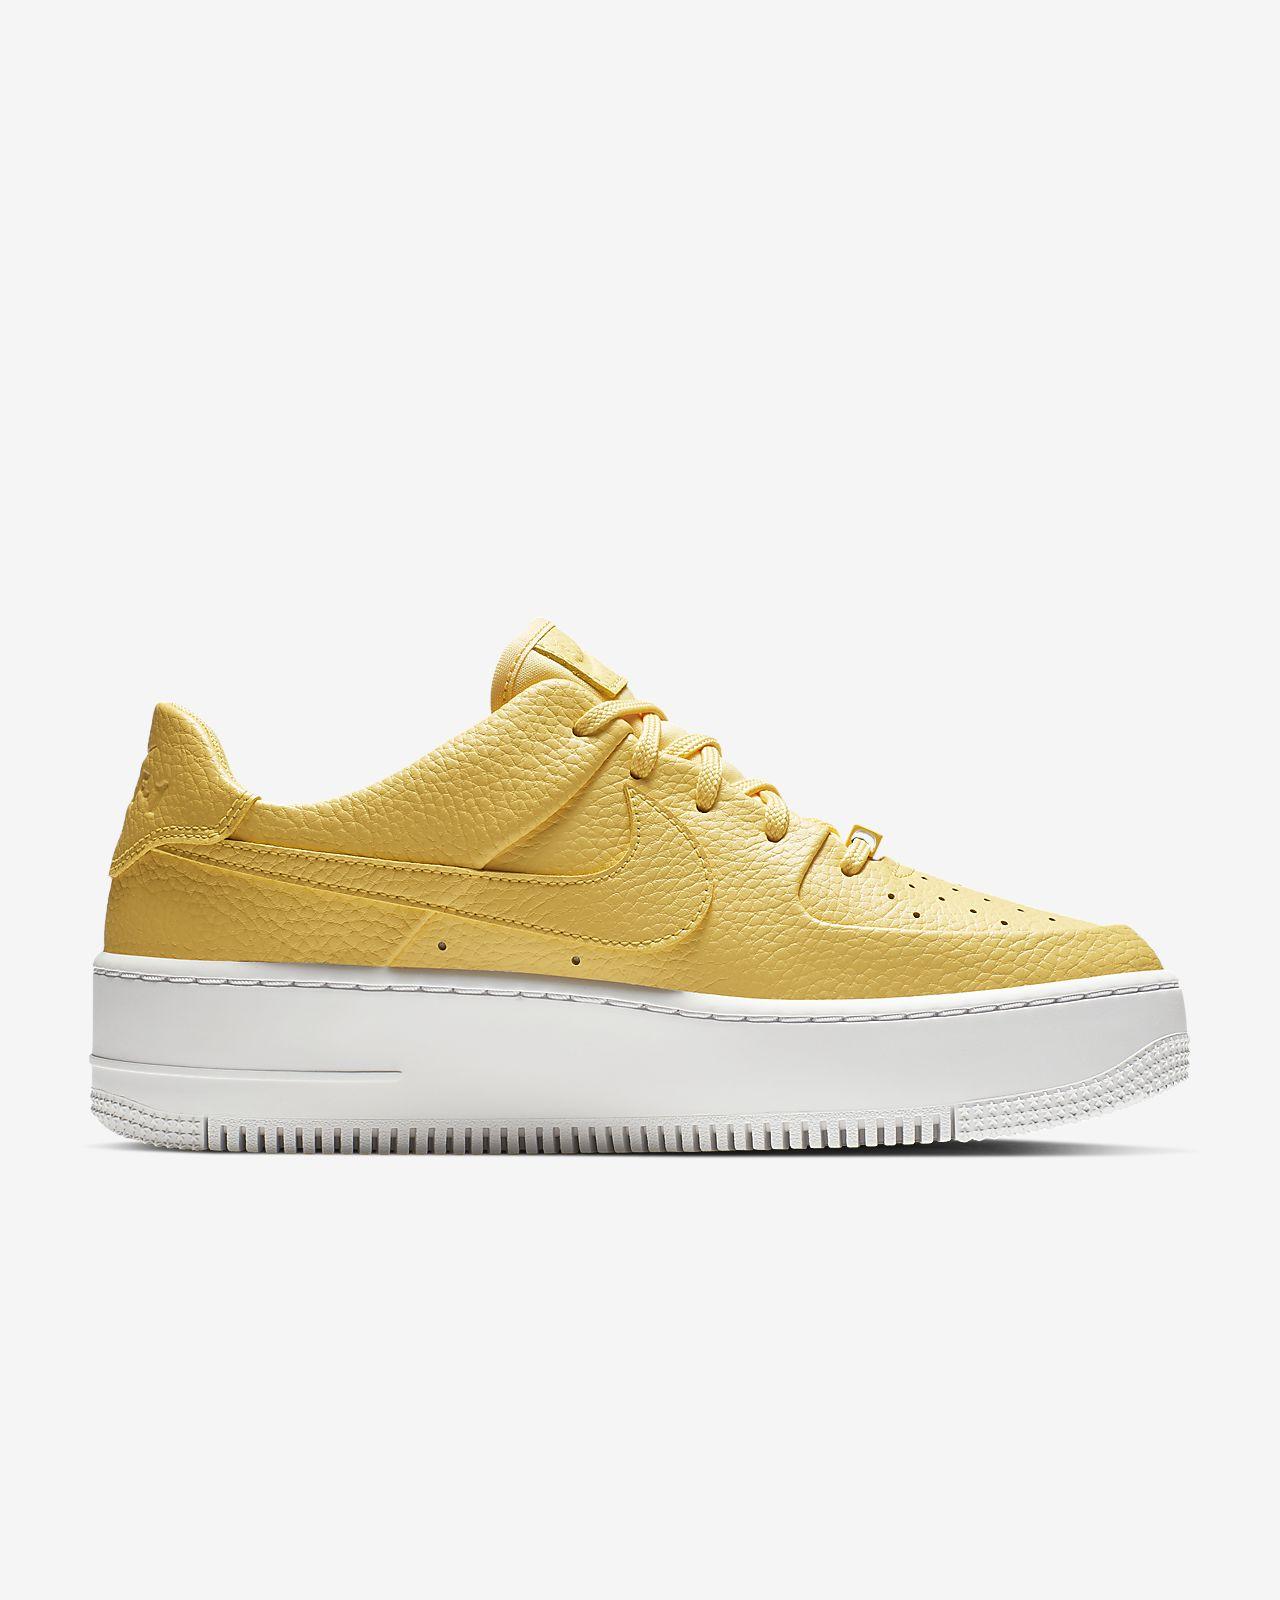 3f882253a Nike Air Force 1 Sage Low Women's Shoe. Nike.com